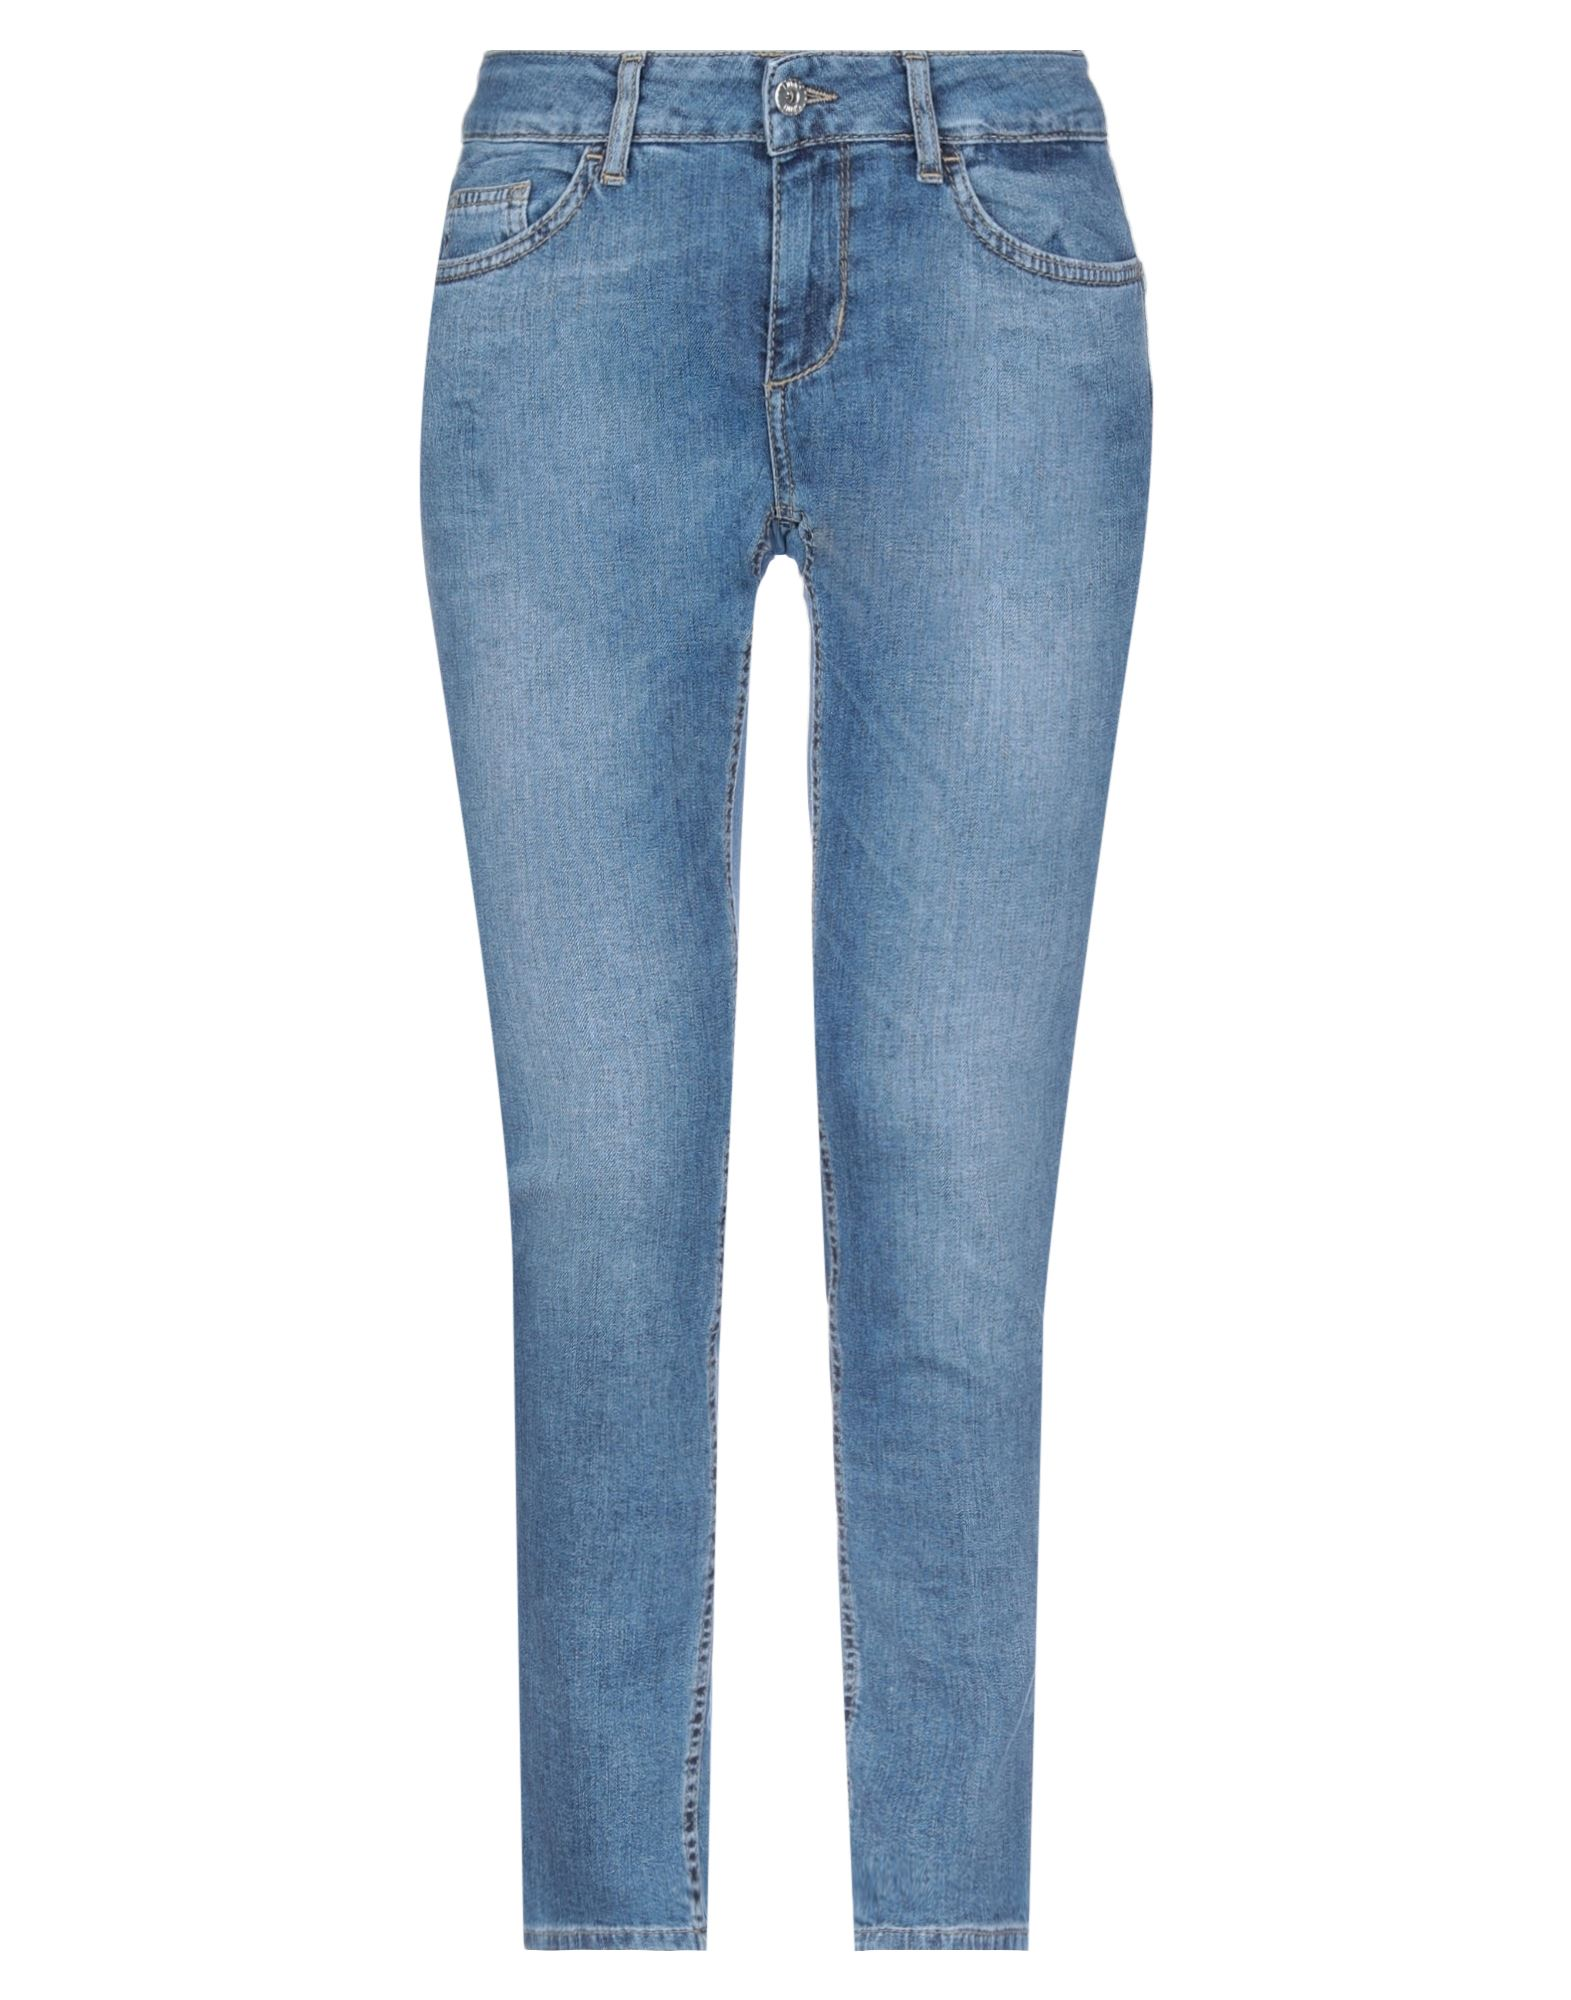 LIU JO Denim pants - Item 42828766